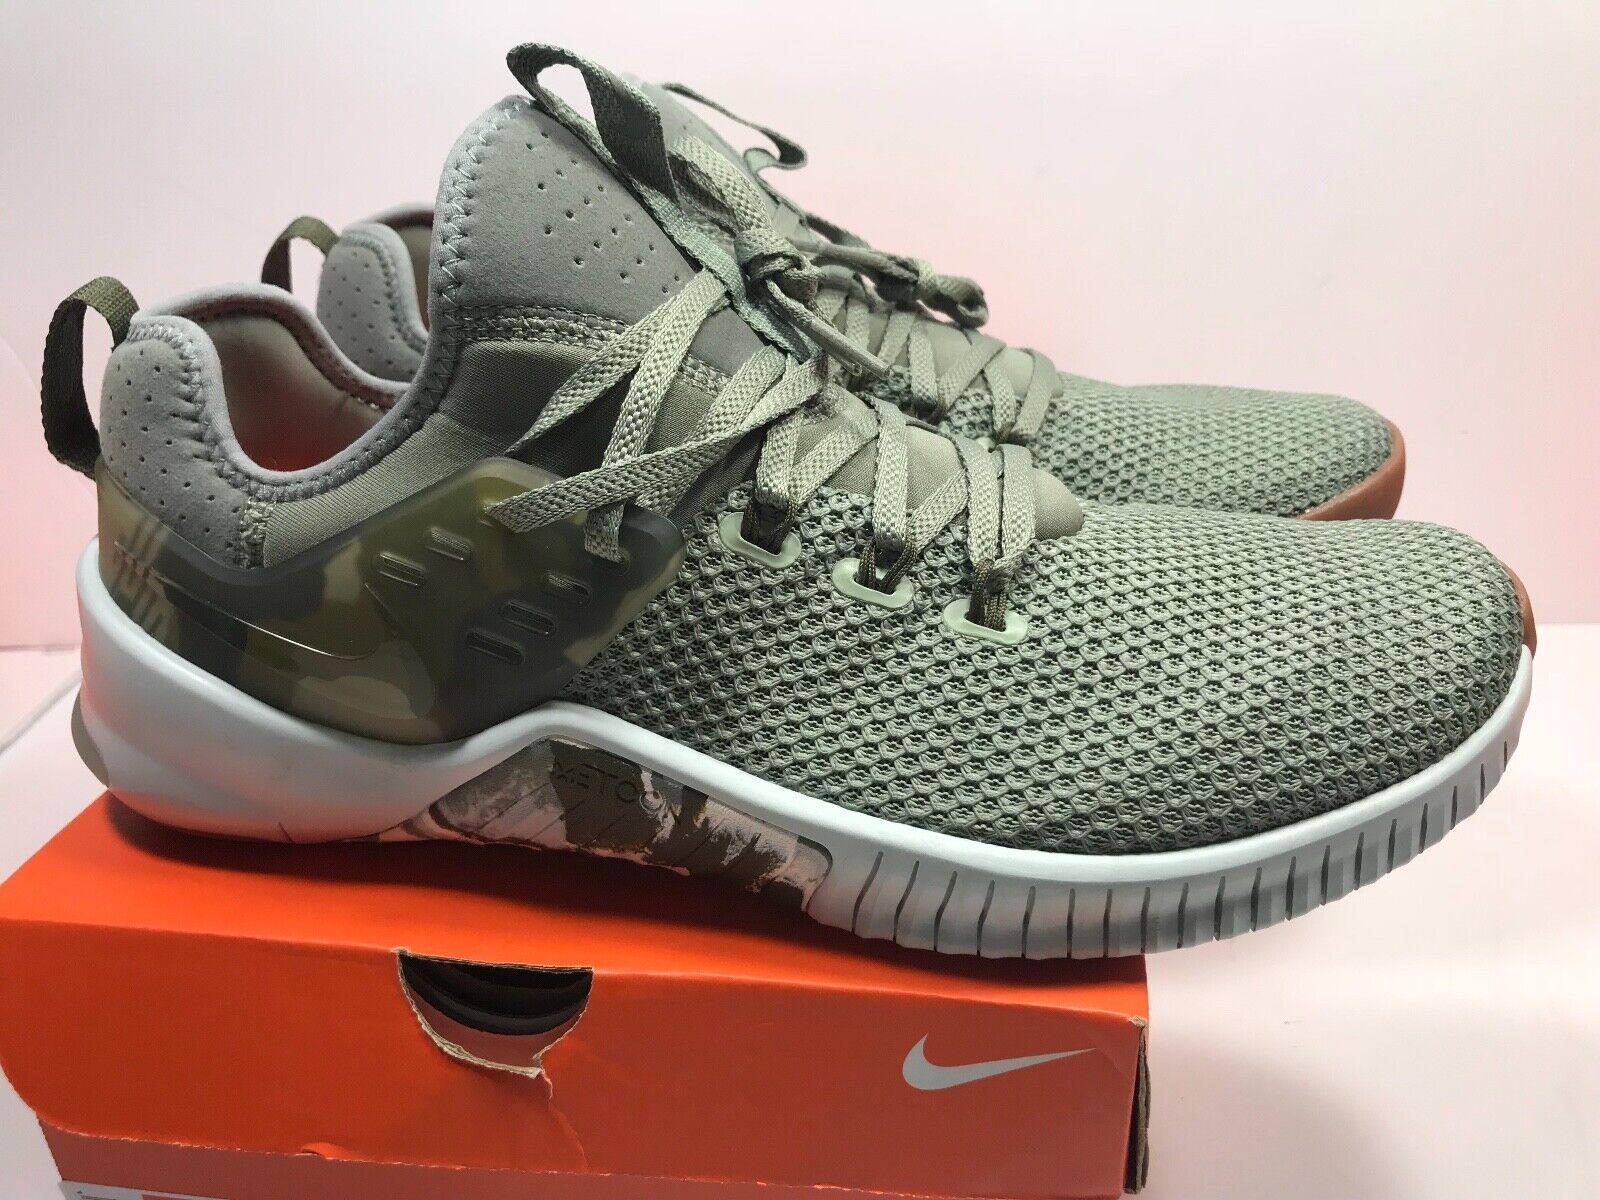 af95b2e5609a8 Nike Men s Free X Metcon Training shoes AH8141 002 size12 8305cb ...